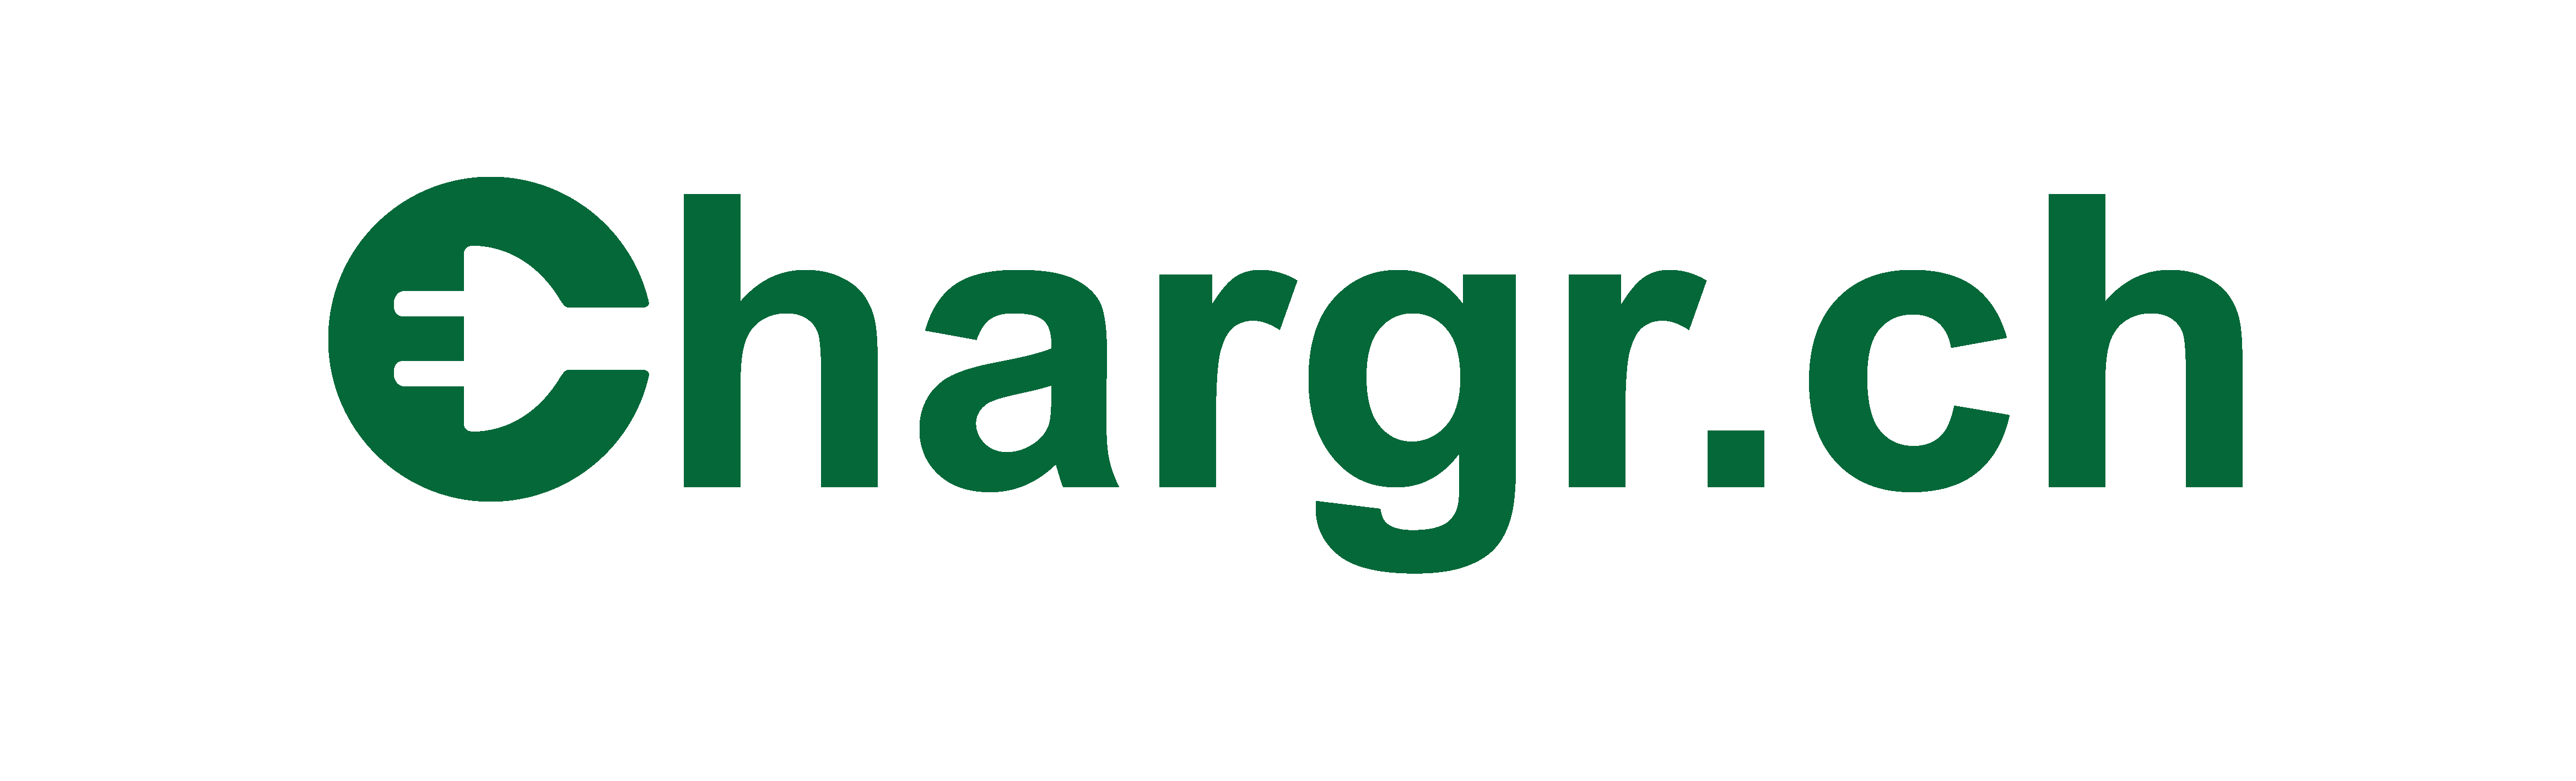 Chargr.ch